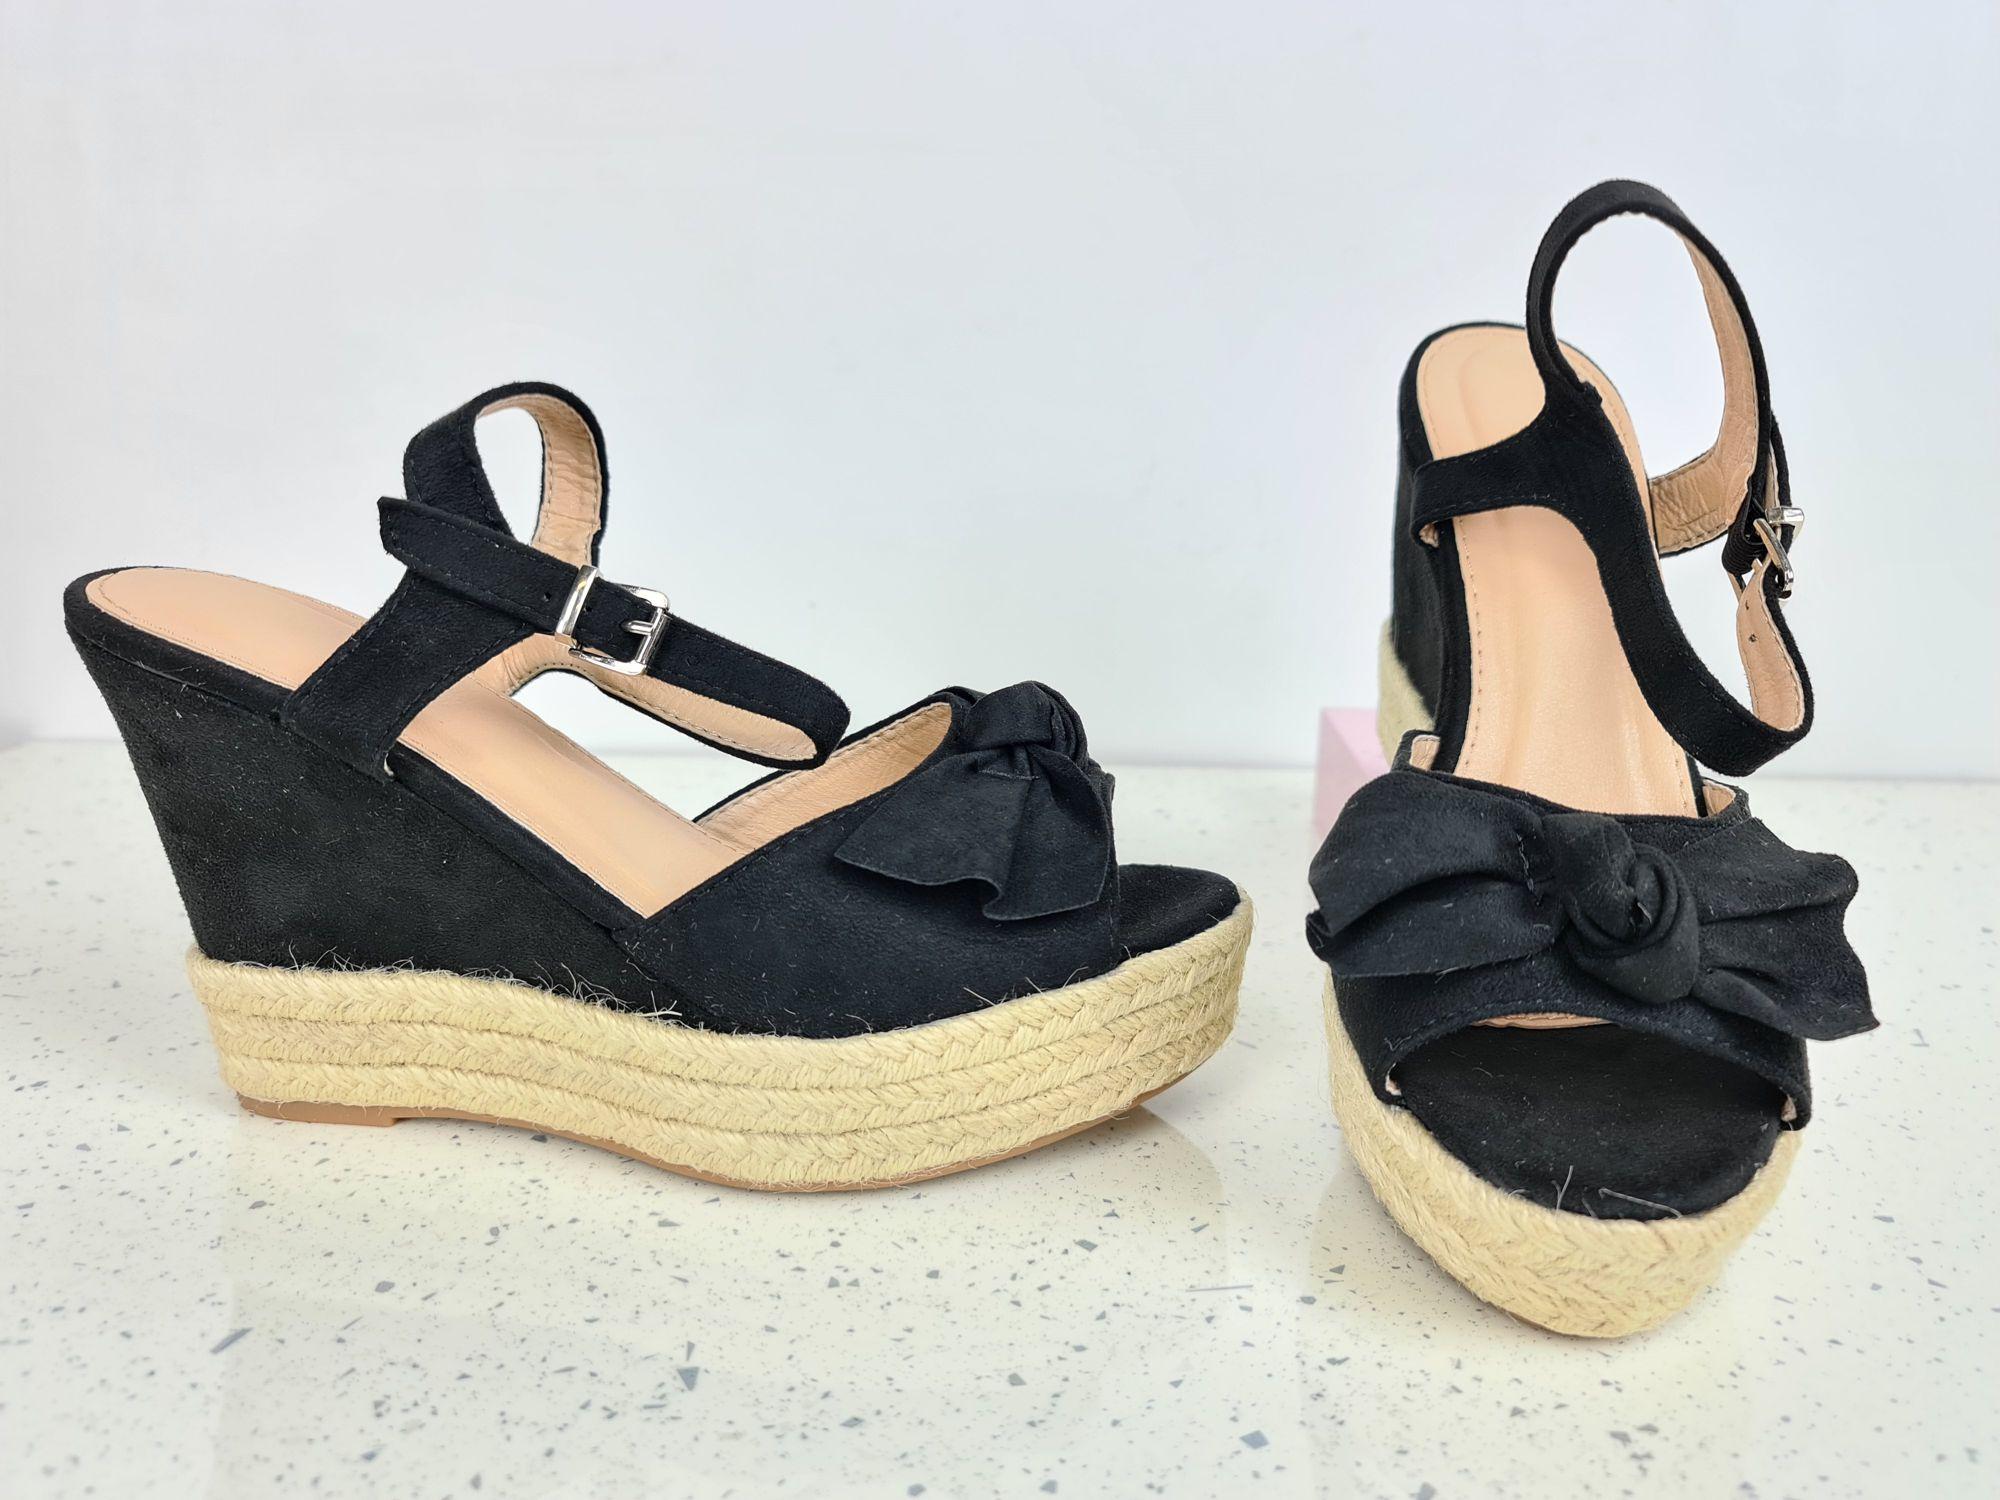 FPSHO001BLK_sandales-wedge-nu-pieds-pinup-50-s-rockabilly-retro-nancy